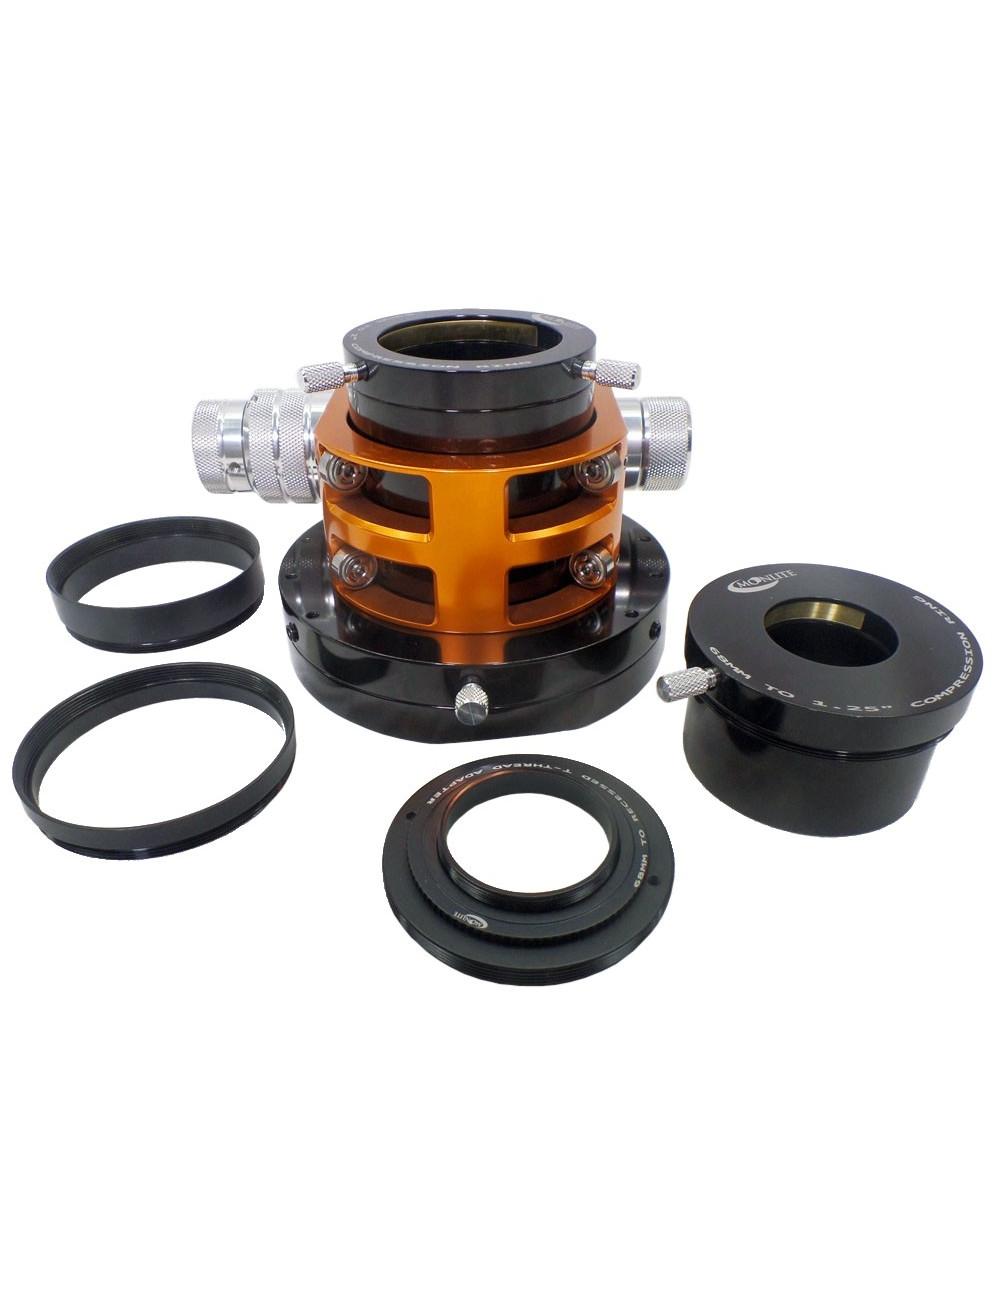 Porte-oculaire Crayford CHL 2,5 pour C11/C14 Edge HD Moonlite